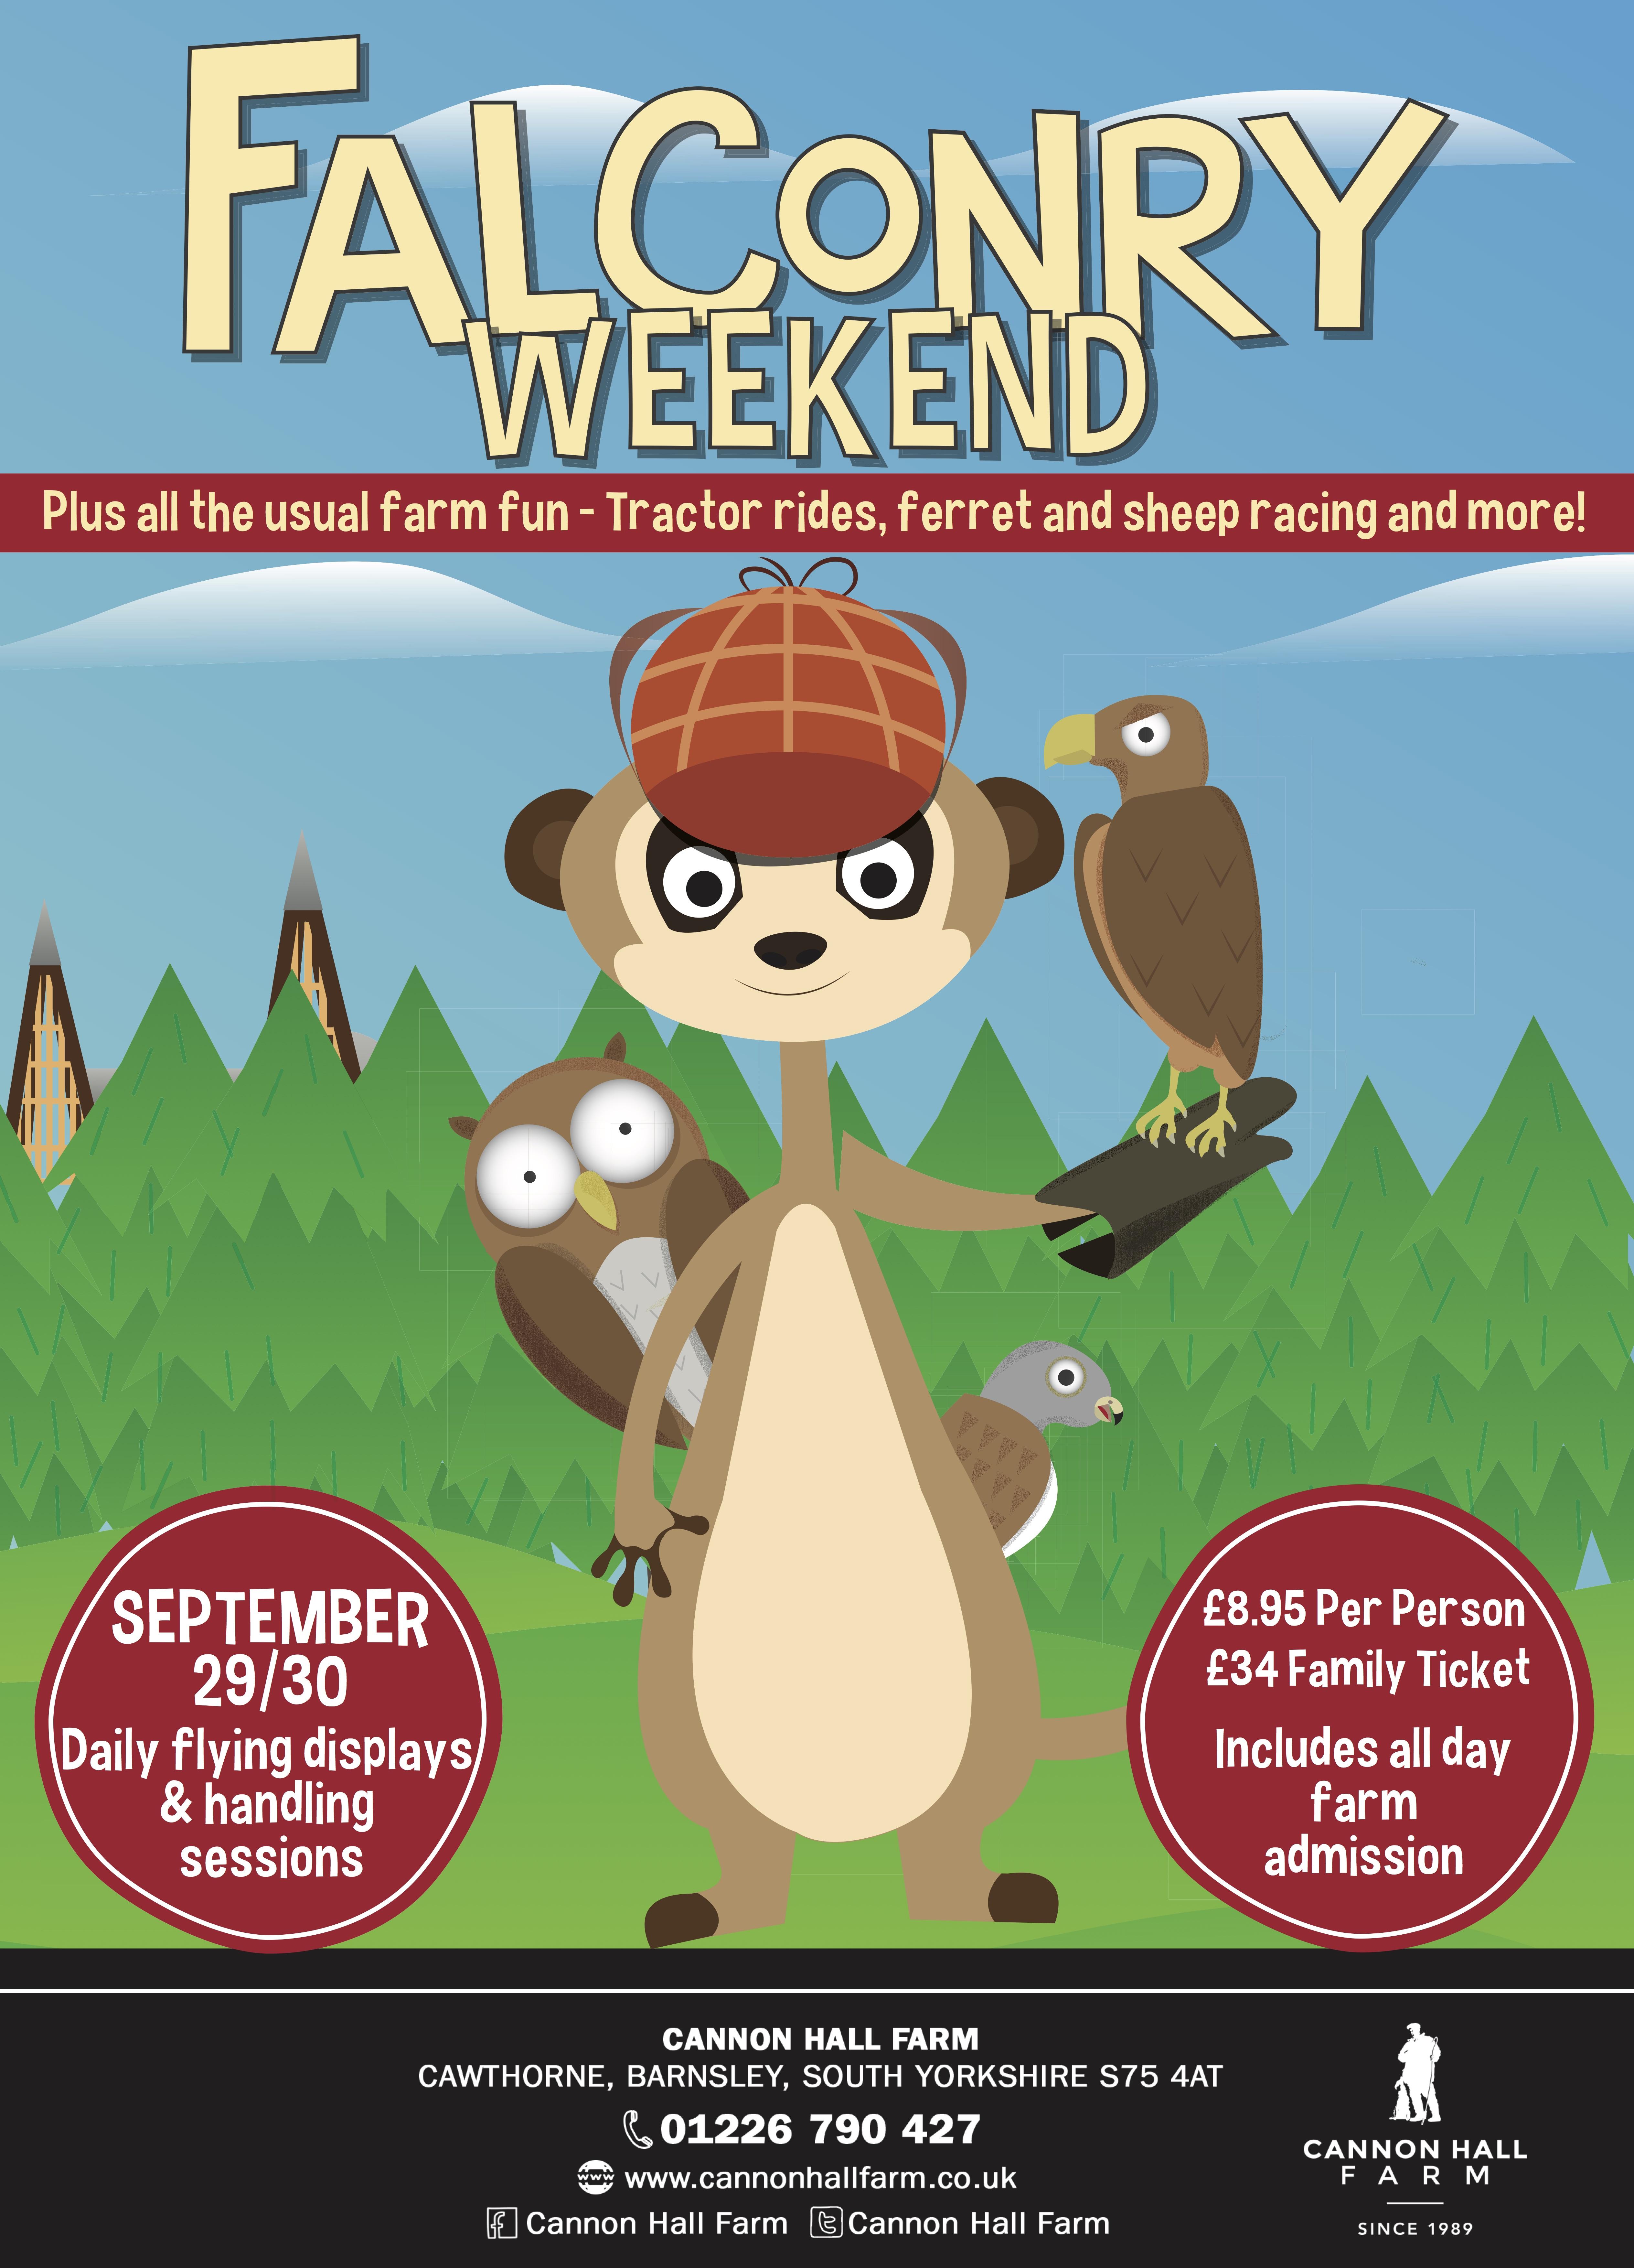 Falconry Weekend Web